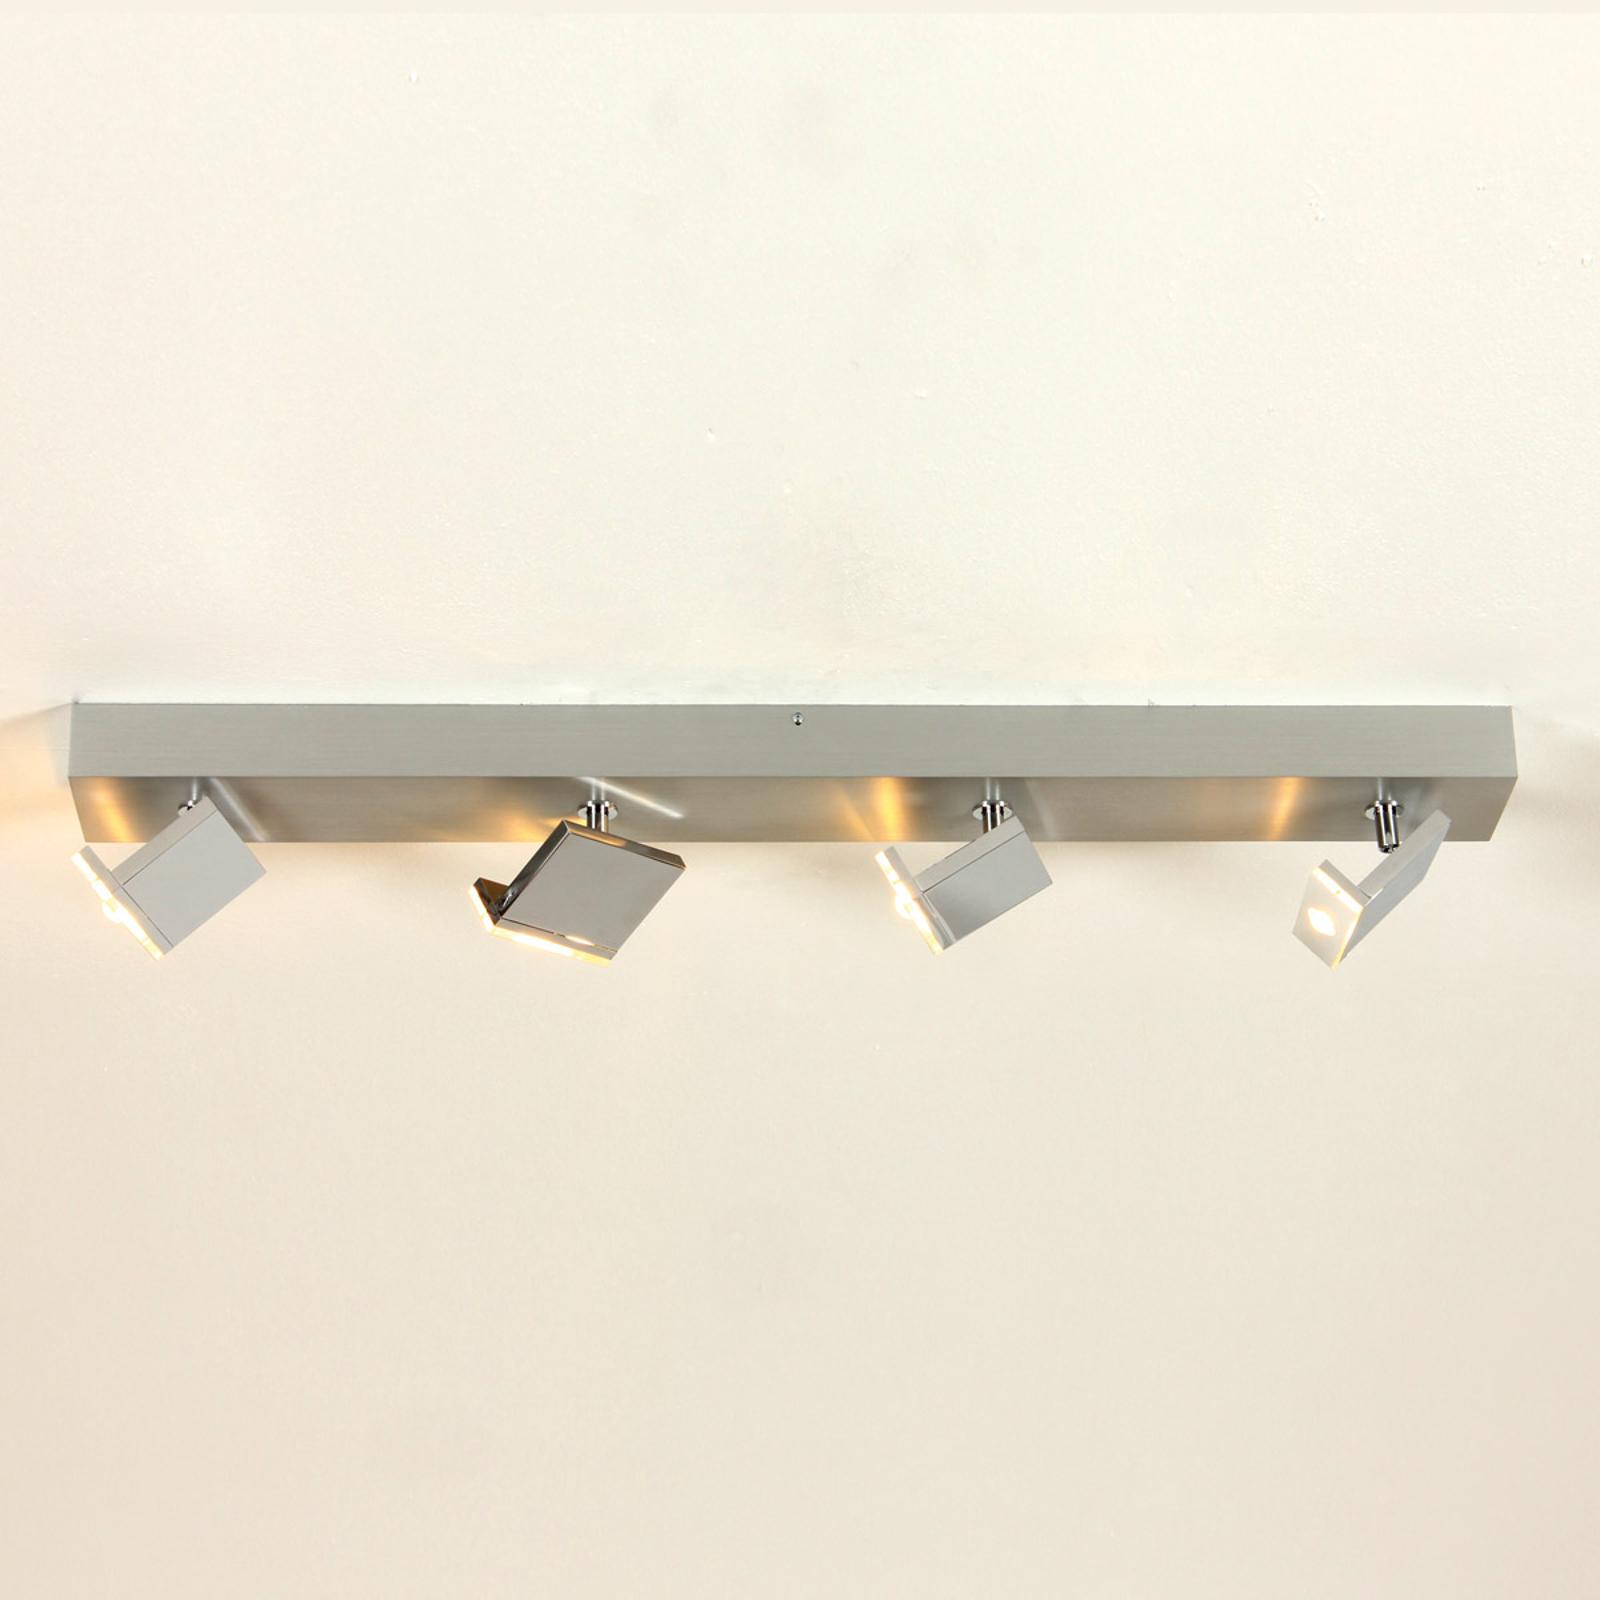 Foco LED Elle de 4 brazos, atenuable